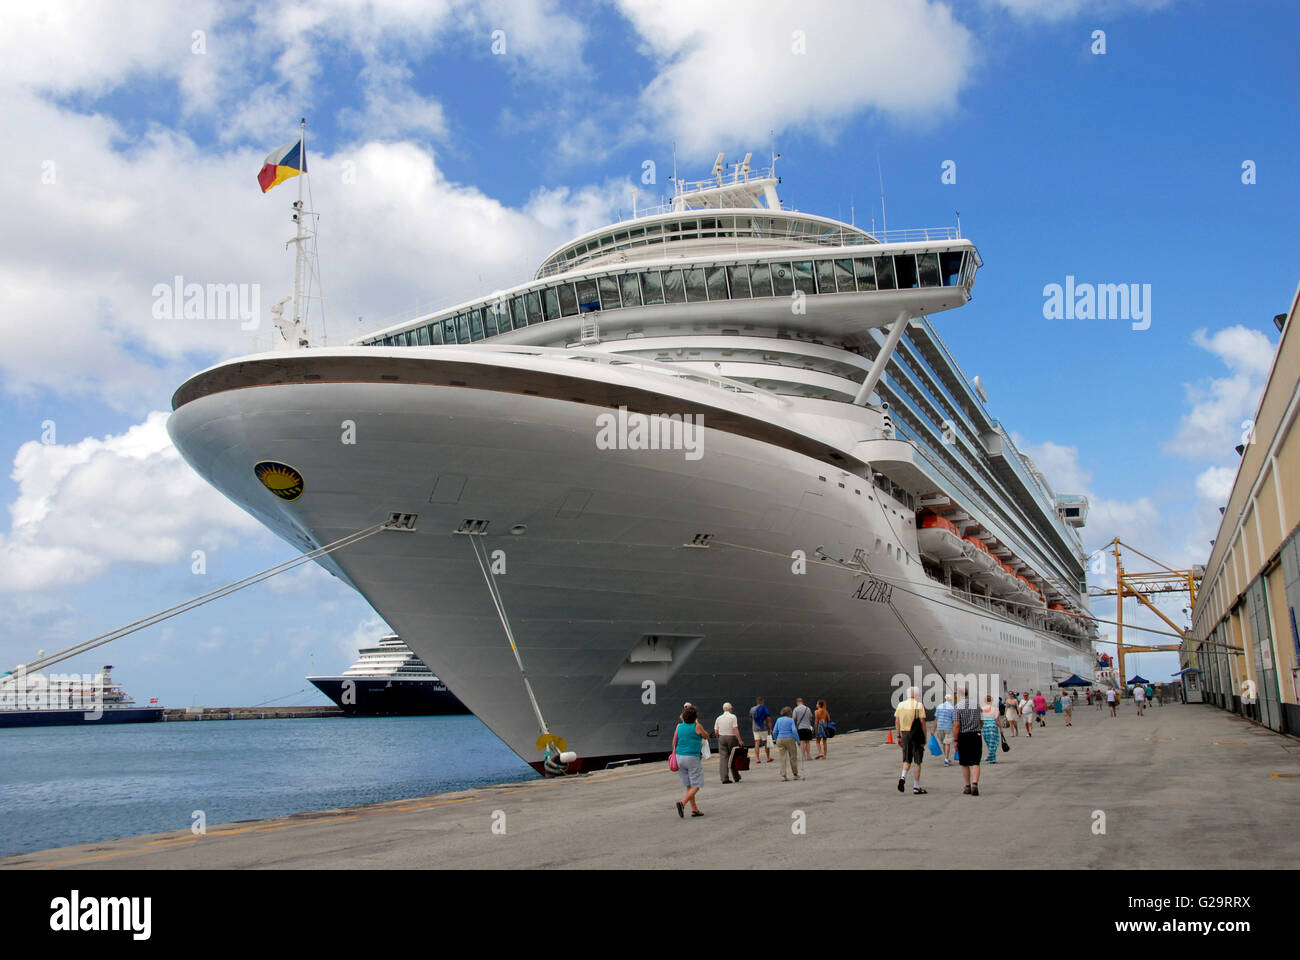 Cruise liners, Bridgetown, Barbados - Stock Image